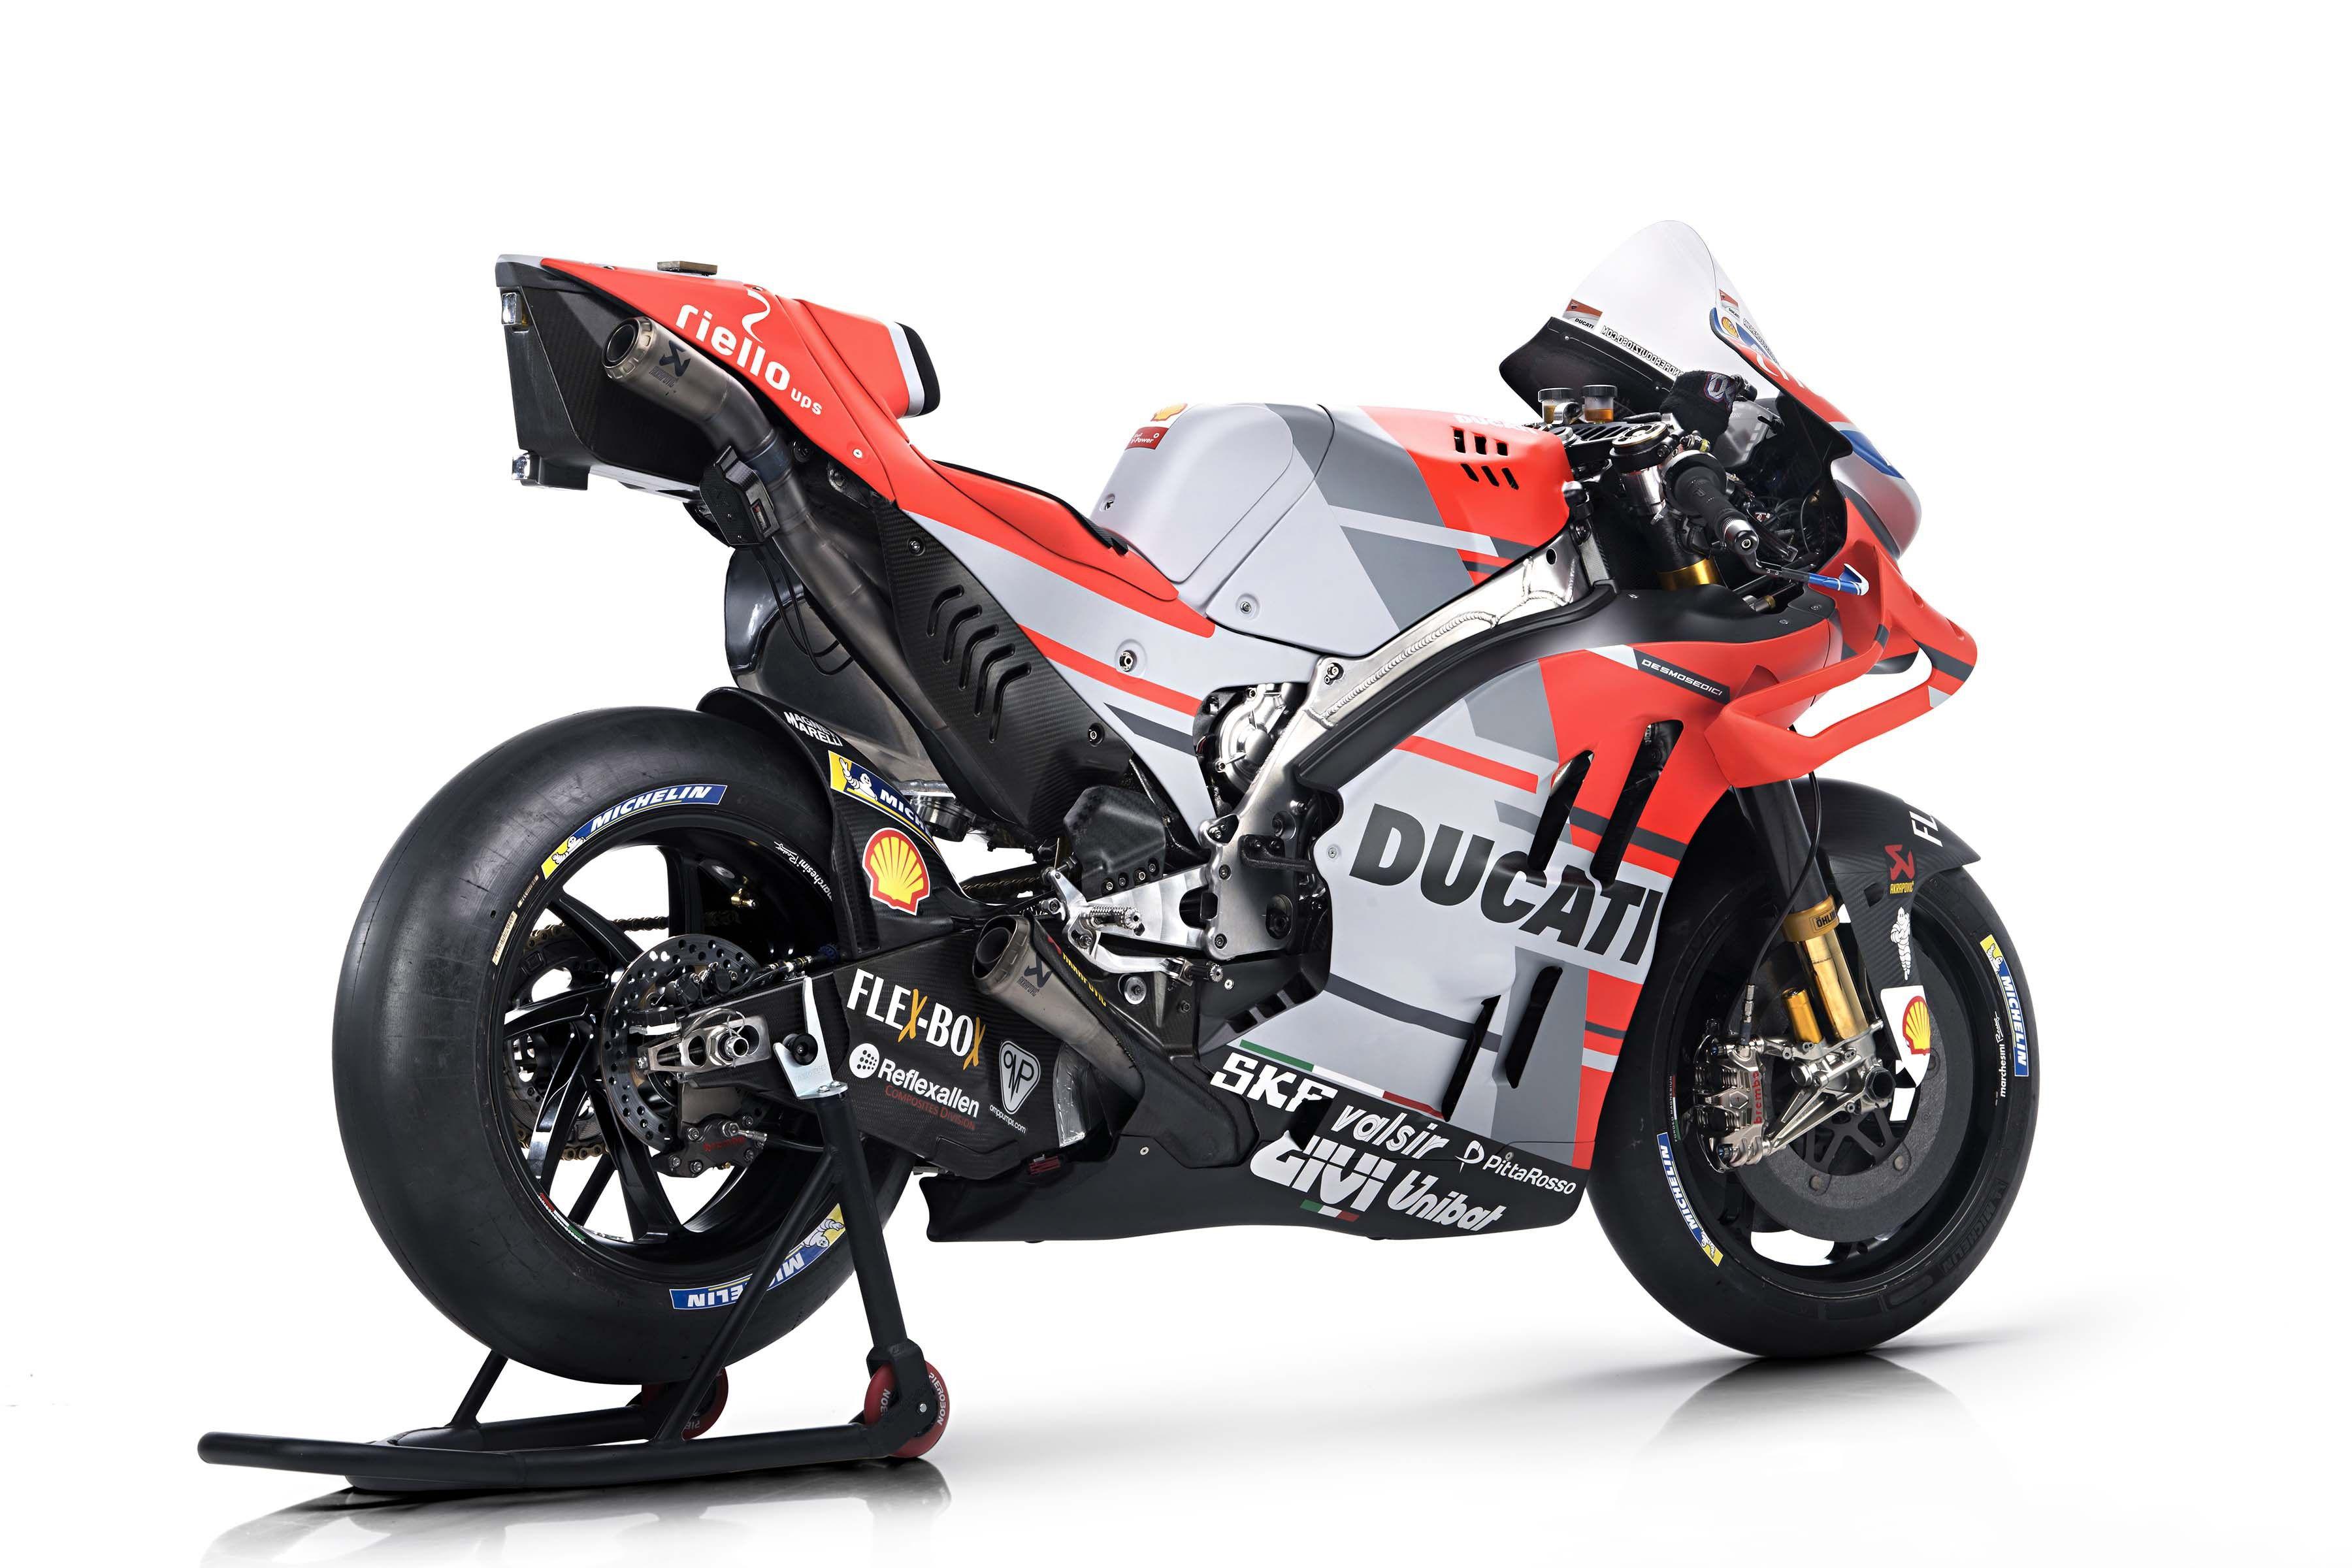 2018 Ducati Motogp Livery Race Bikes Pinterest Ducati Motogp